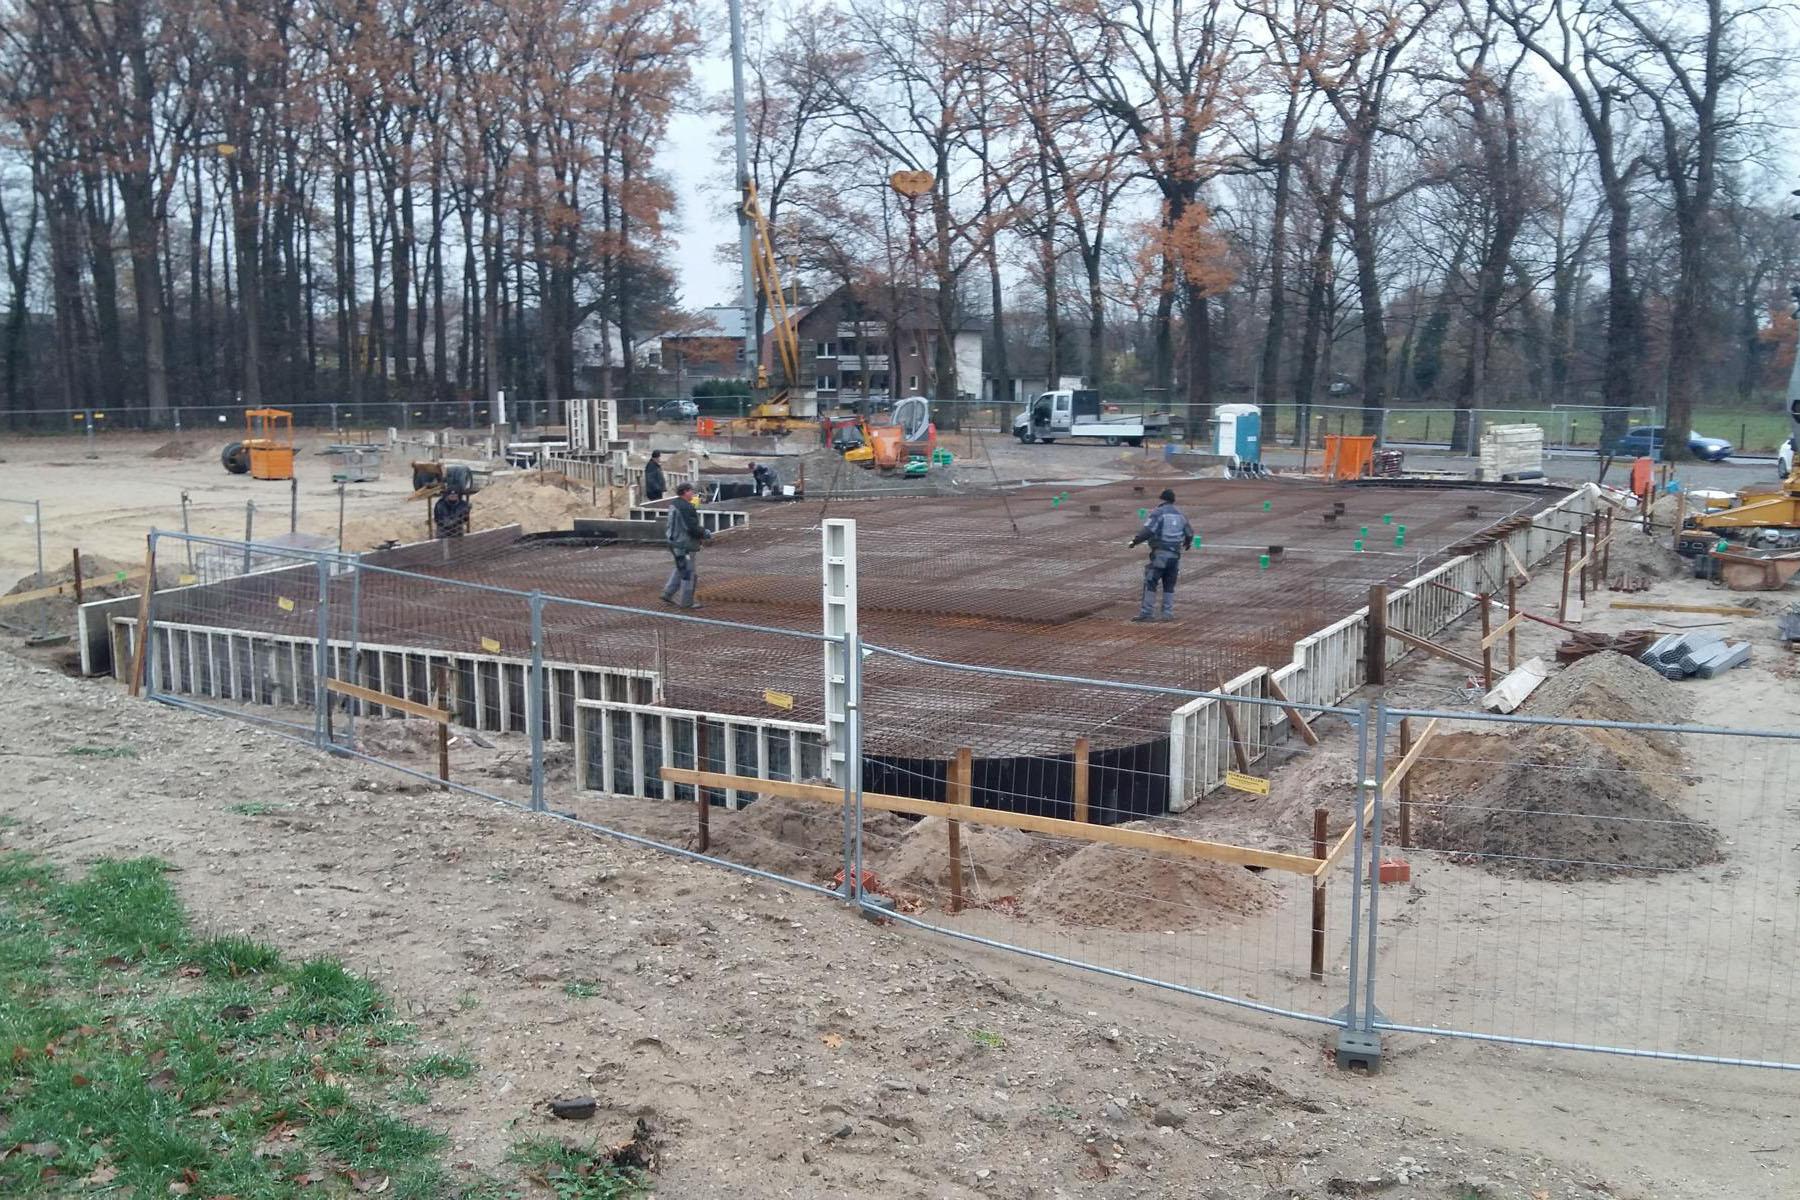 Spatenstich - Beginn der Bauarbeiten der KiTa Bohlenweg in Paderborn-ElsenOktober 2018